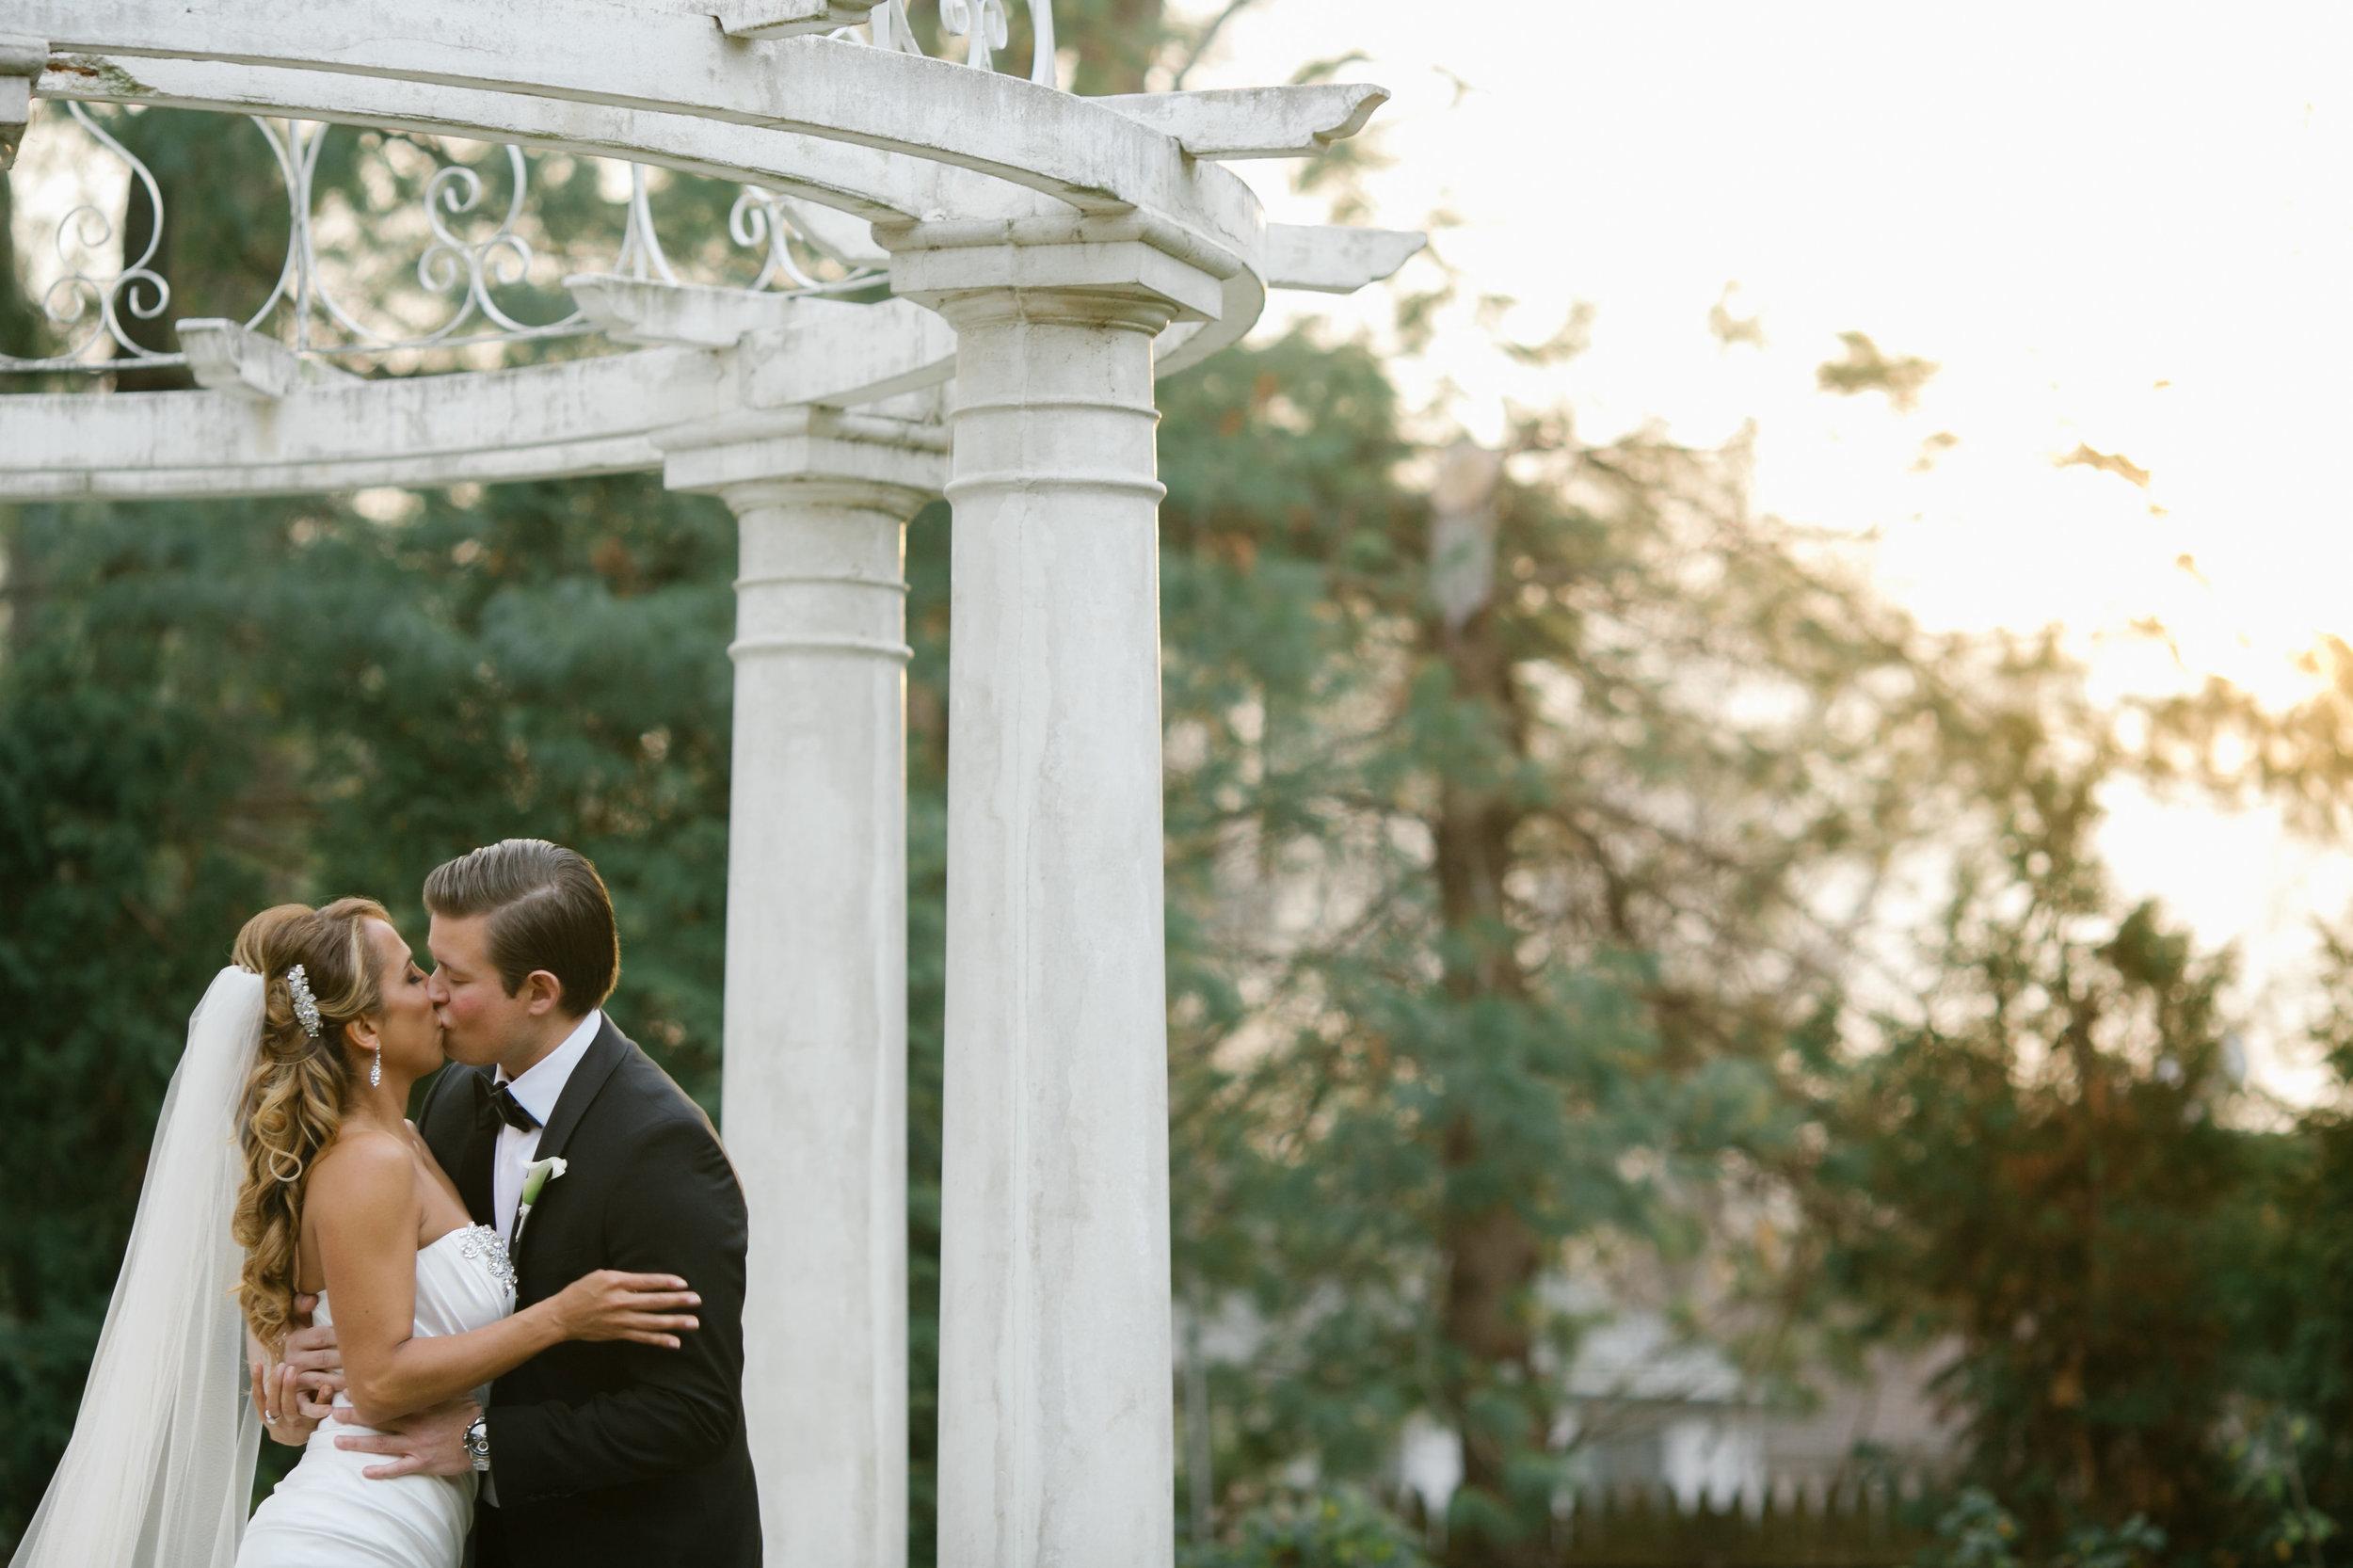 Ceci_New_York_Custom_Invitation_ New_Jersey_Wedding_Luxury_Personalized_Ceci_Style_Bride_Foil_Stamping30.jpg